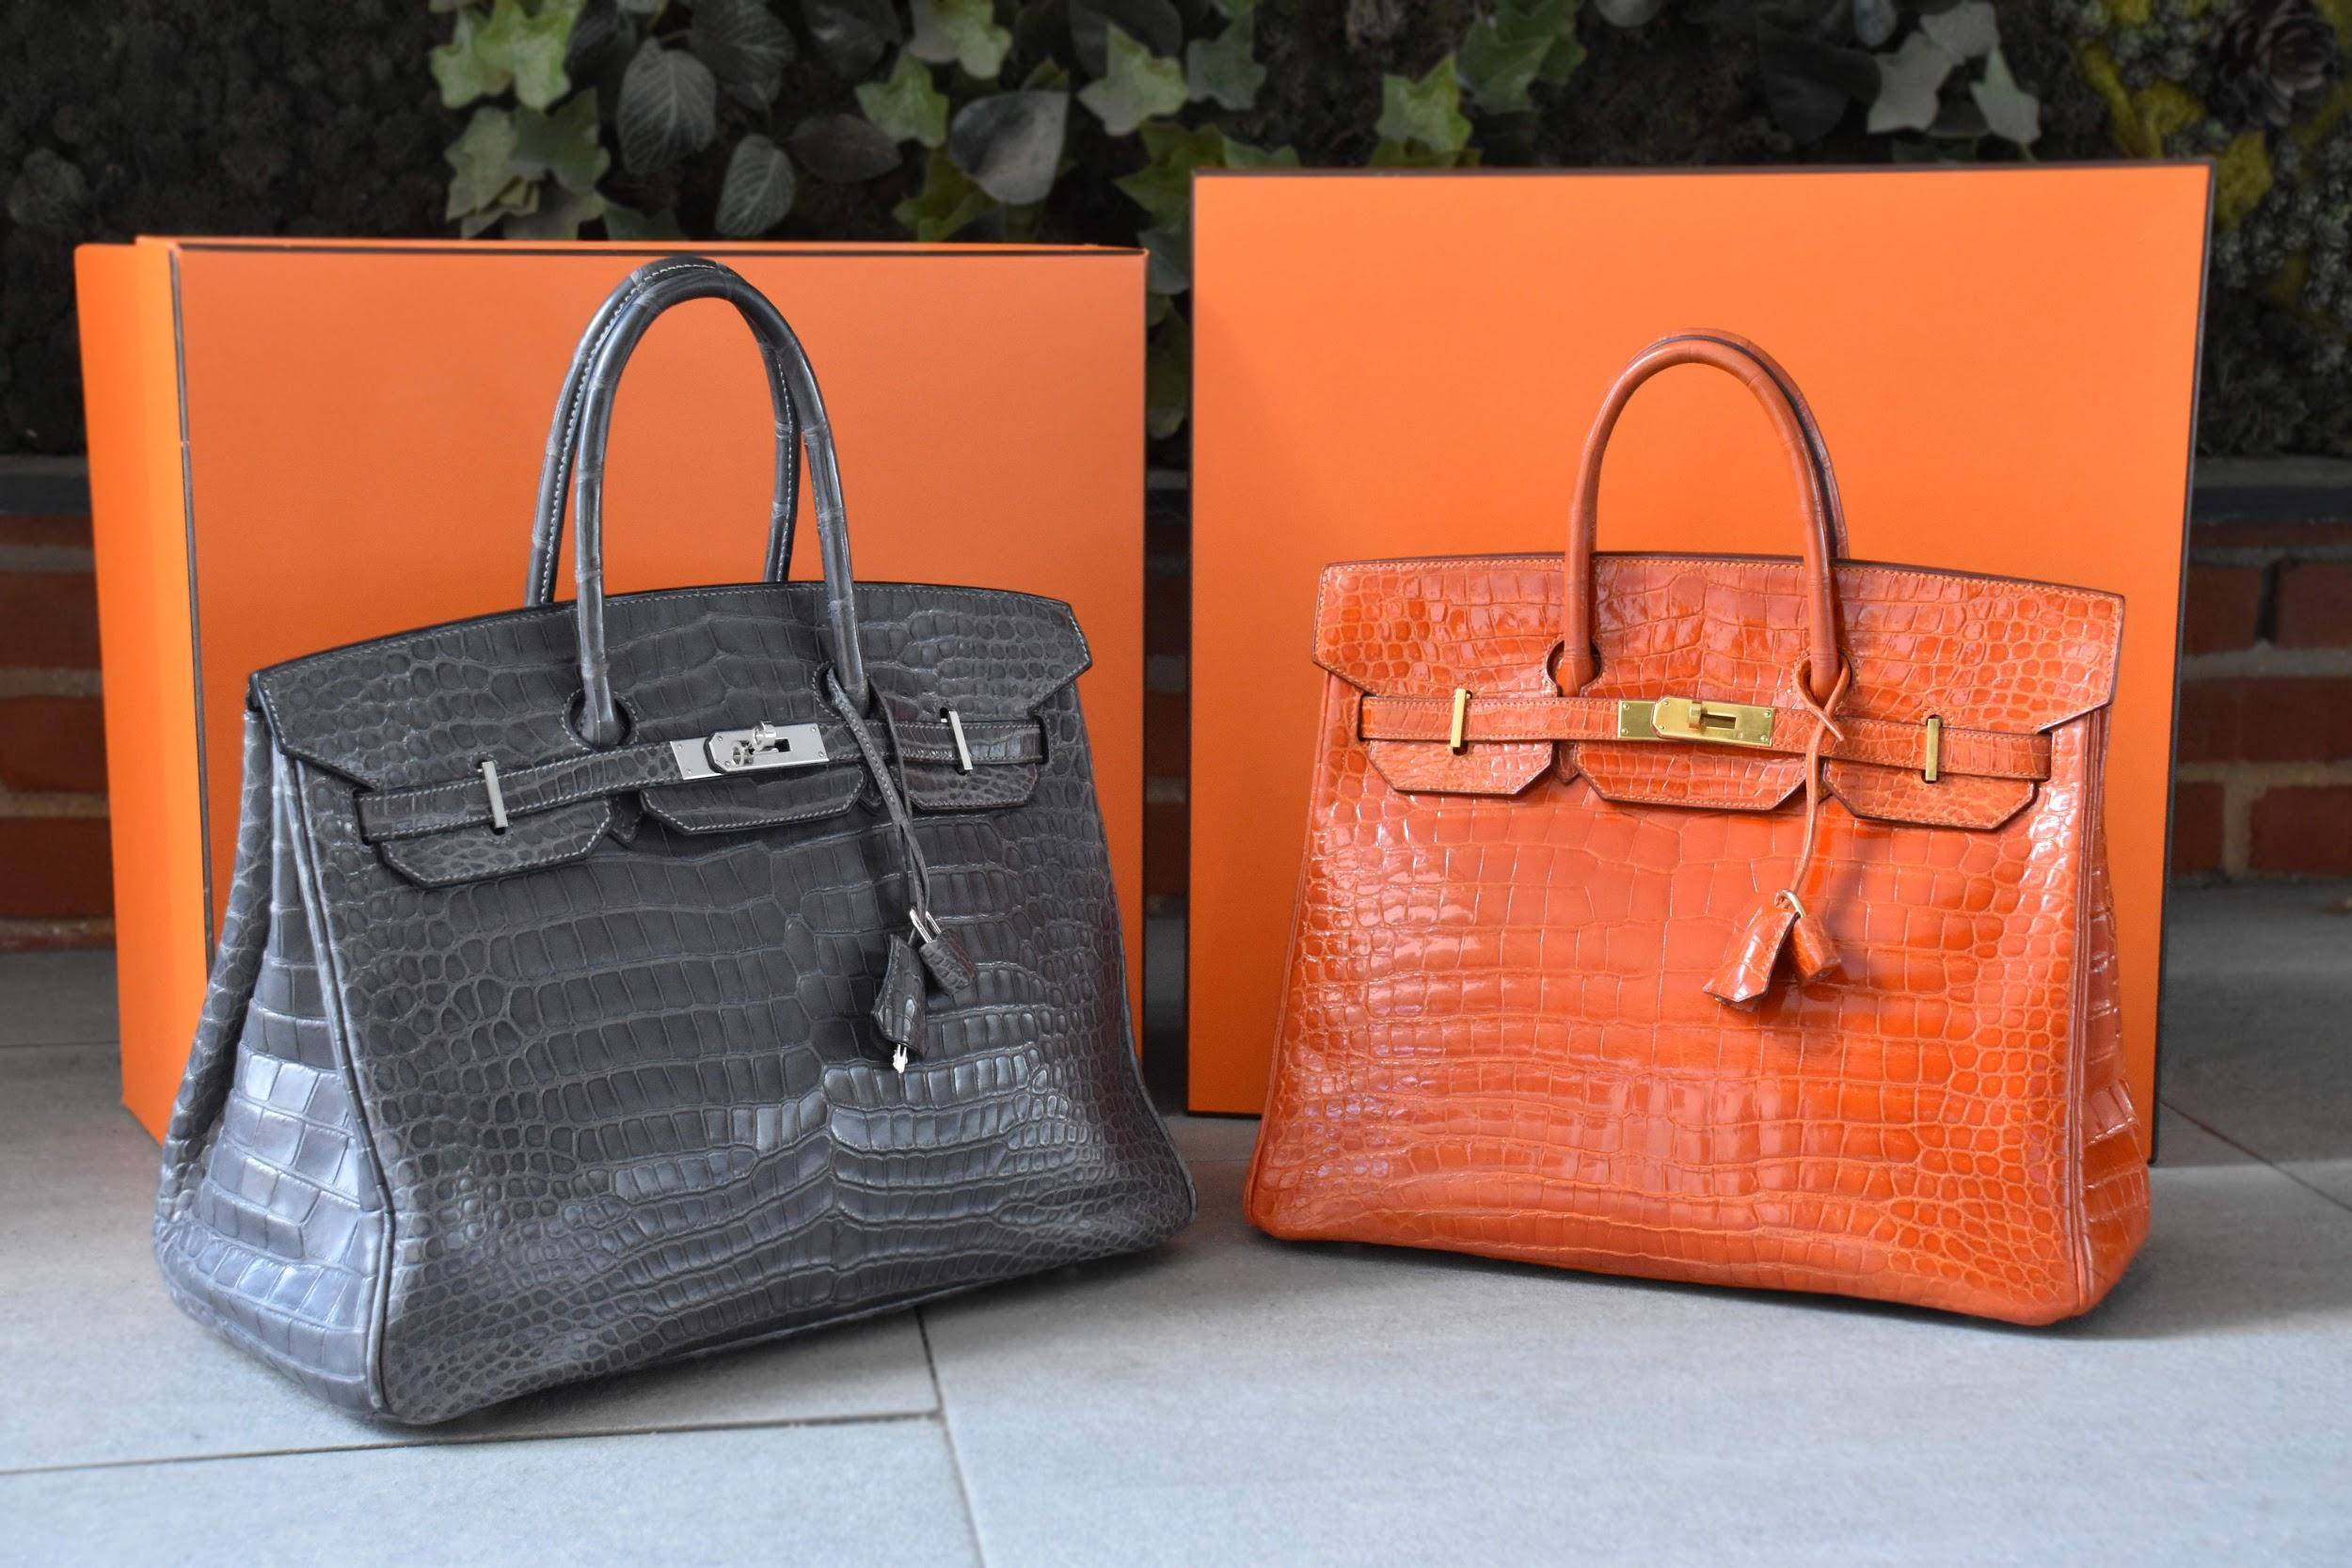 2 Hermes Birkin bags in Alligator Skin